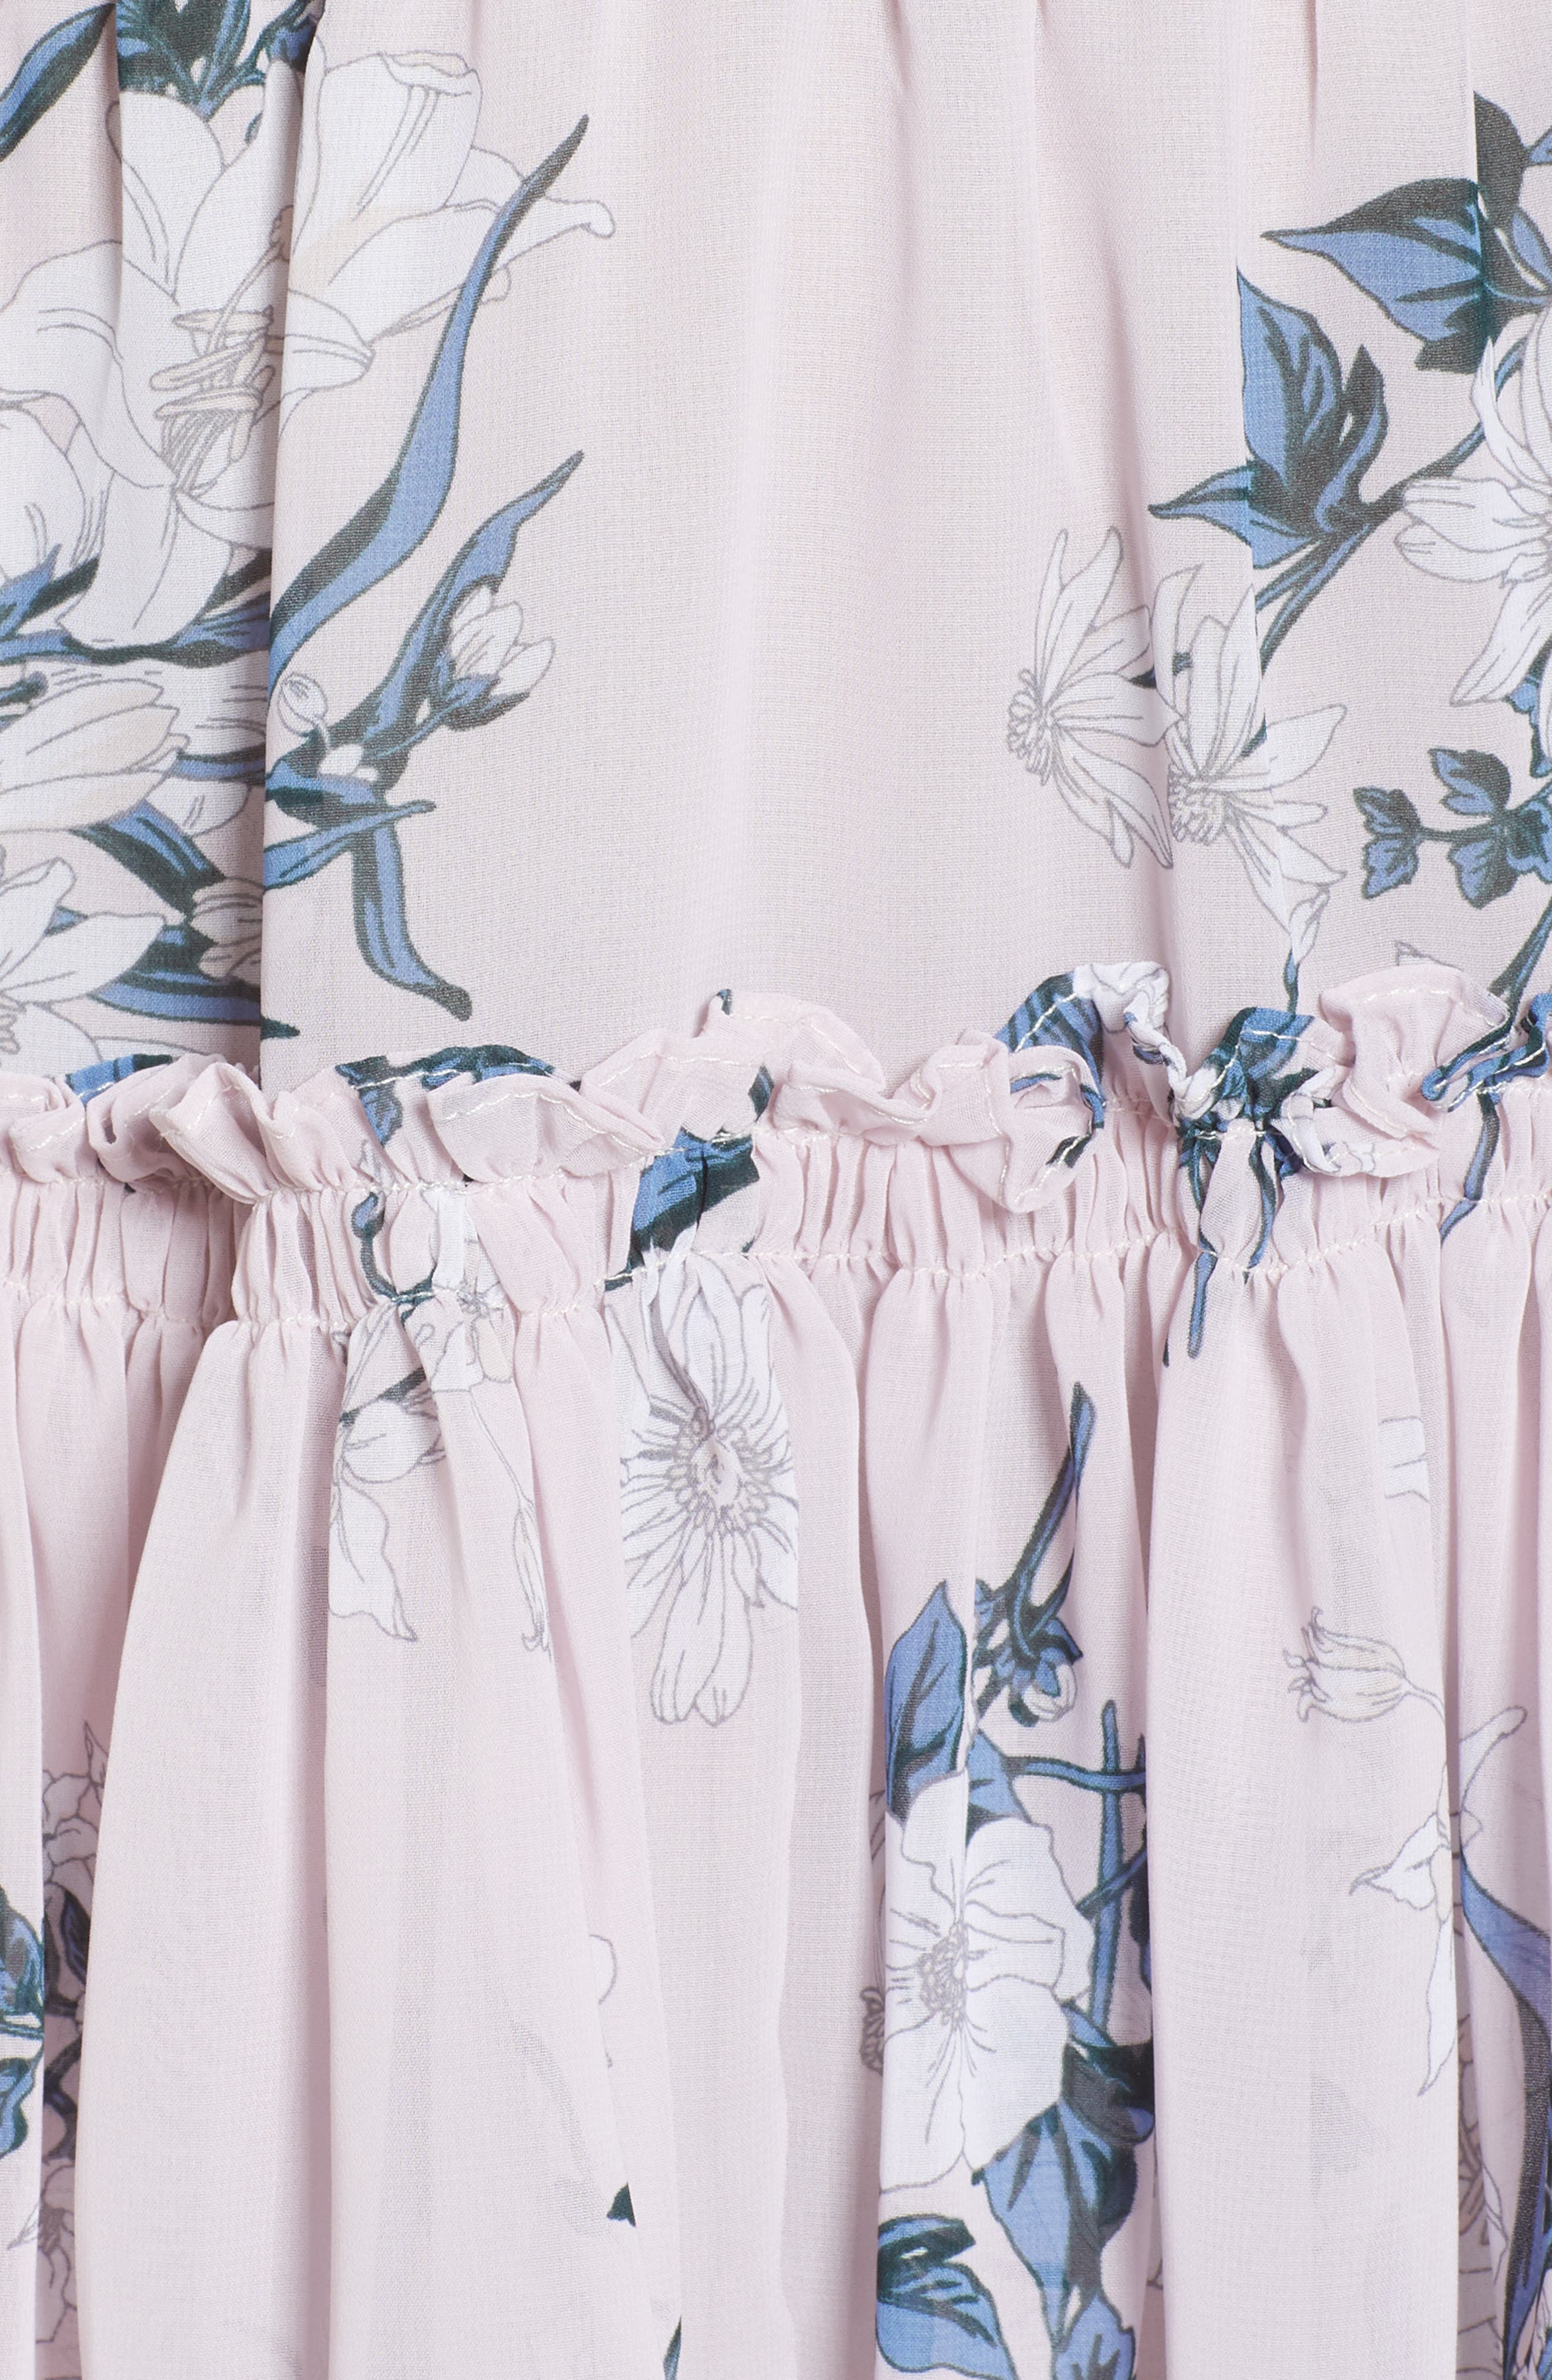 Lullu Dress,                             Alternate thumbnail 6, color,                             Multi Fe15